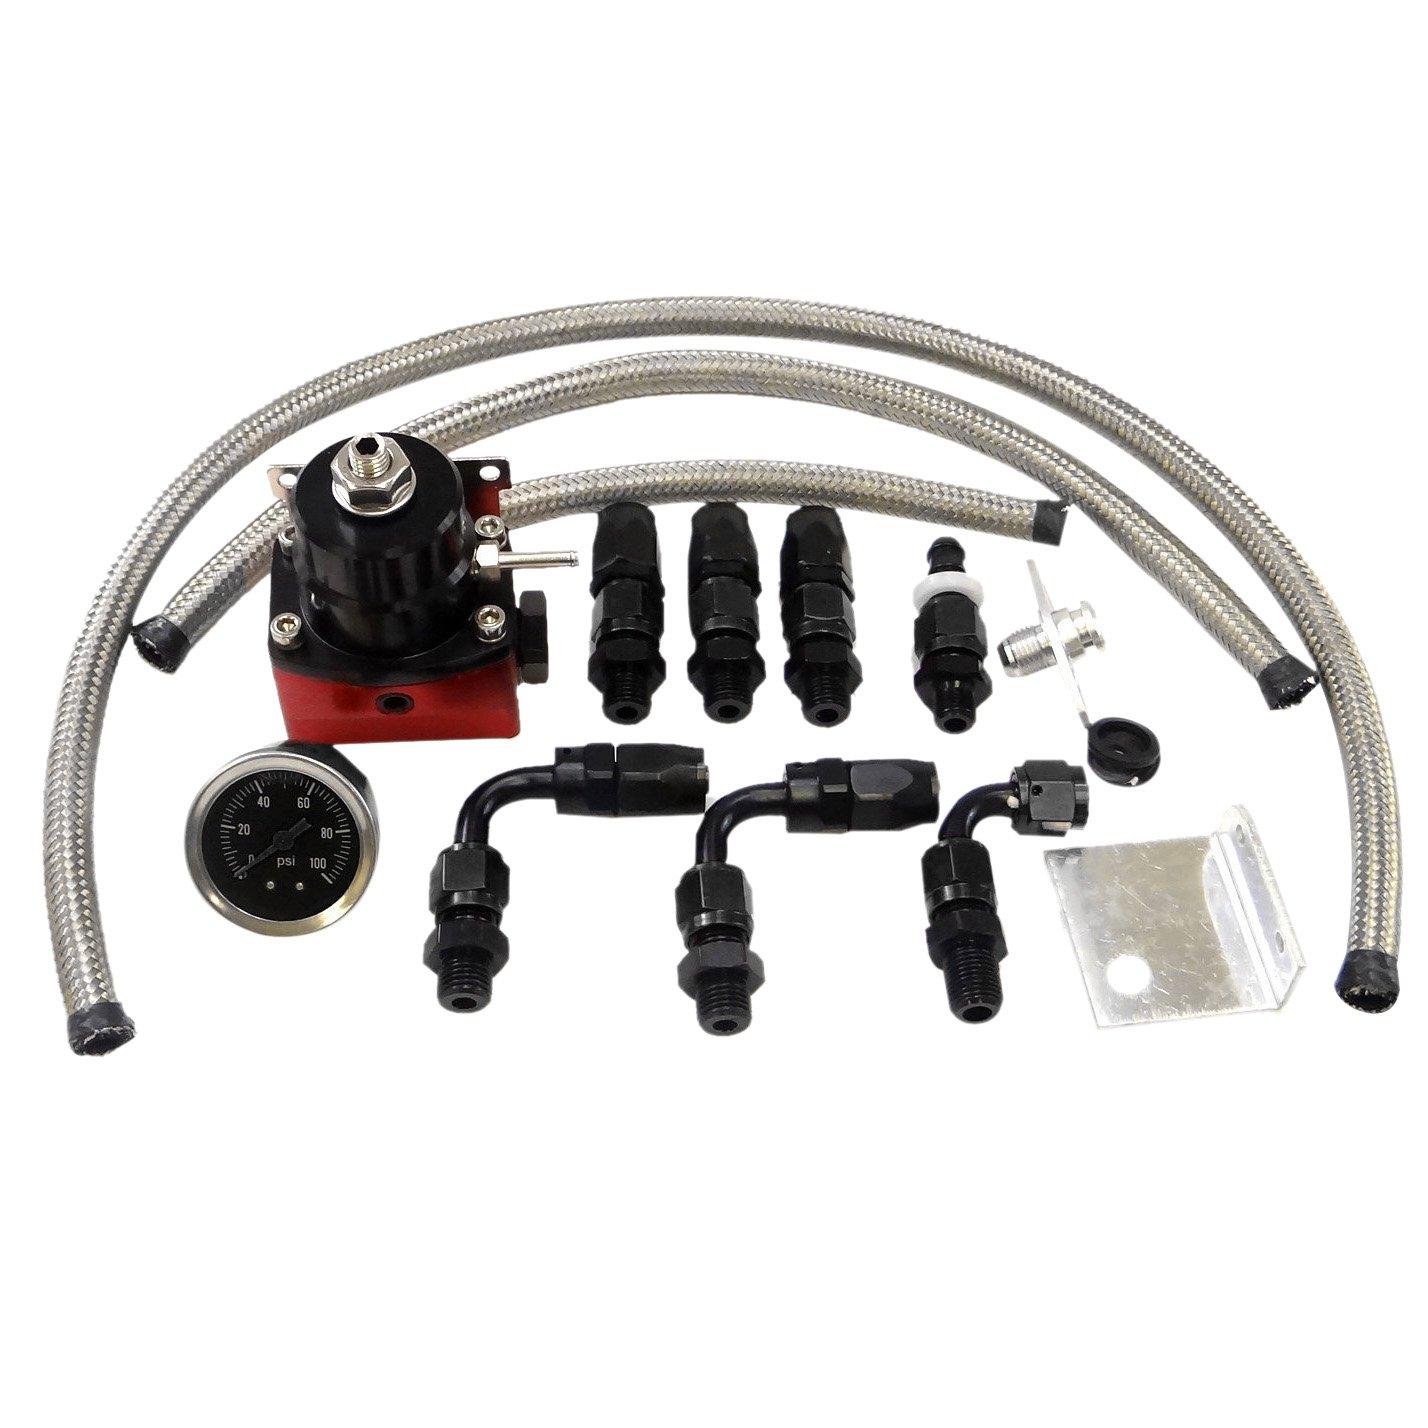 Universal Adjustable EFI Aluminum Fuel Pressure Regulator Kit with 0-100 psi Gauge AN6-6AN Fuel Line Hose Fittings (Black) by Maxon Auto Corp.